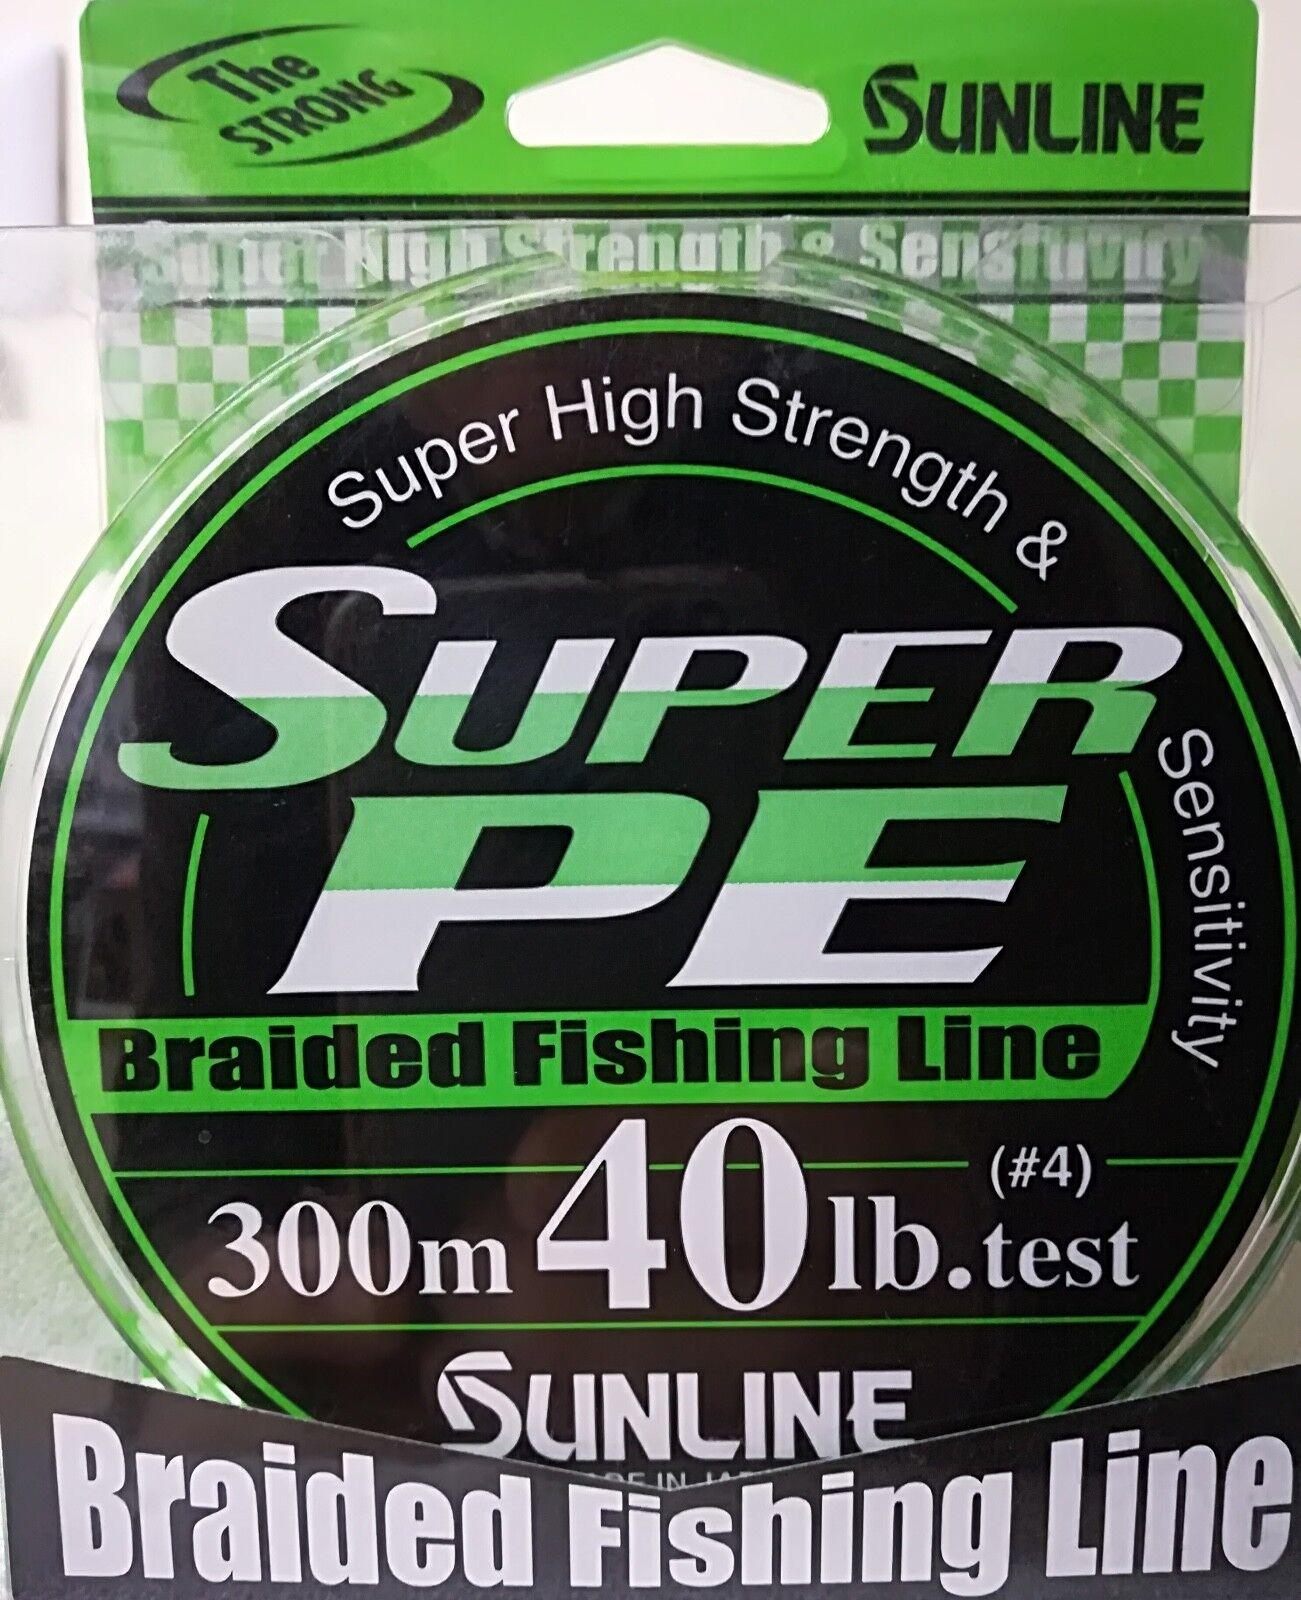 SUNLINE SUPER PE  BRAIDED DYNEEMA LINE 300m 40lb  PE 4 COLOR Grün FLUO JAPAN 4005b7